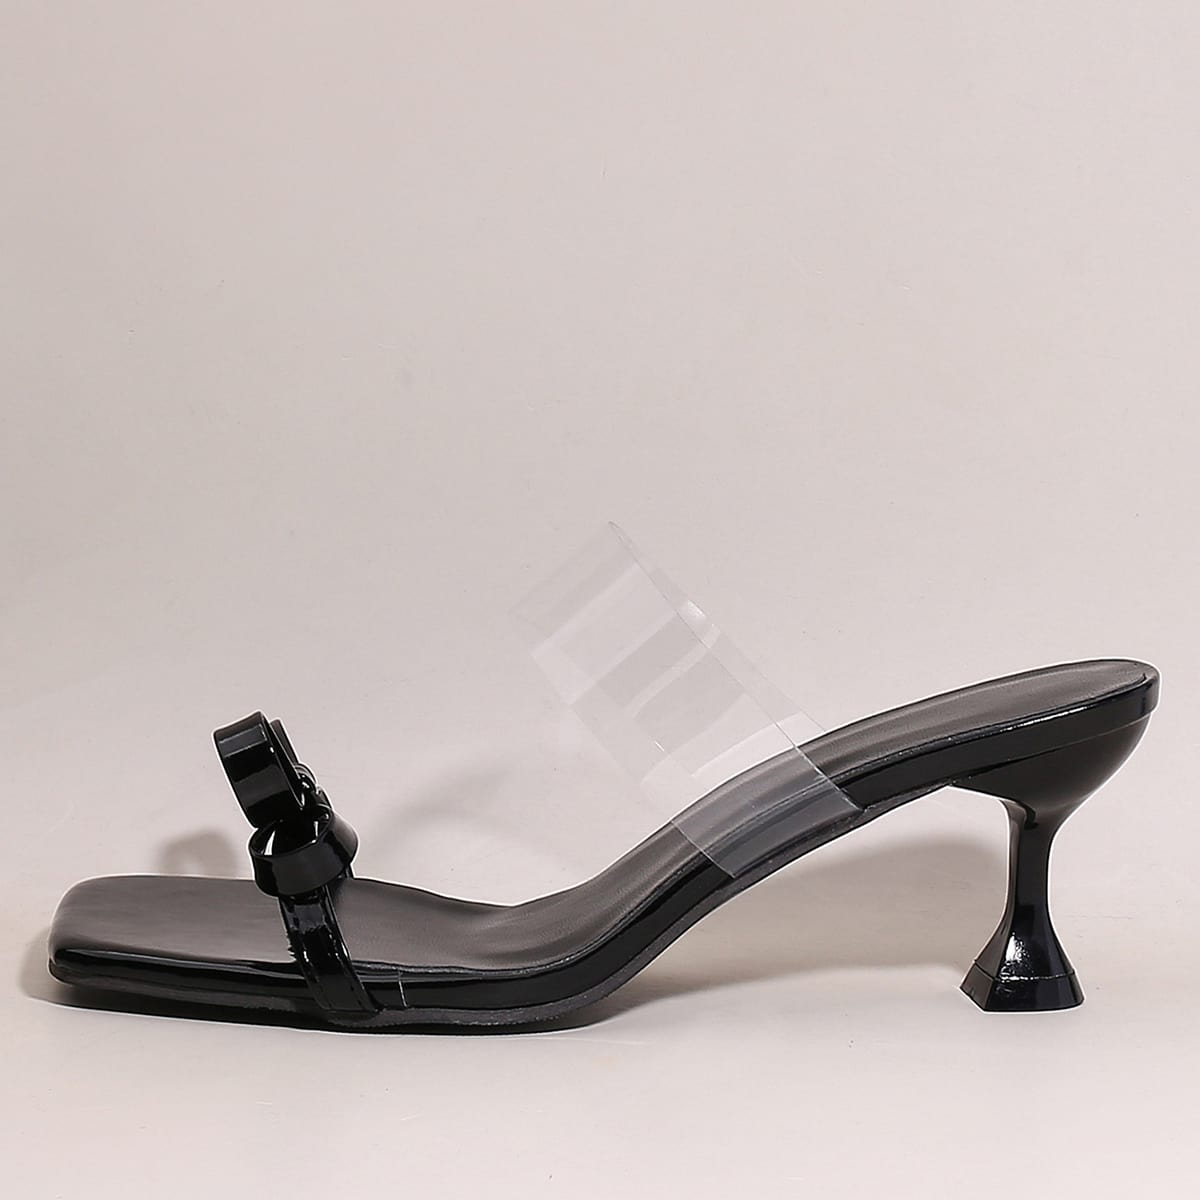 Сандалии на каблуках с бантом